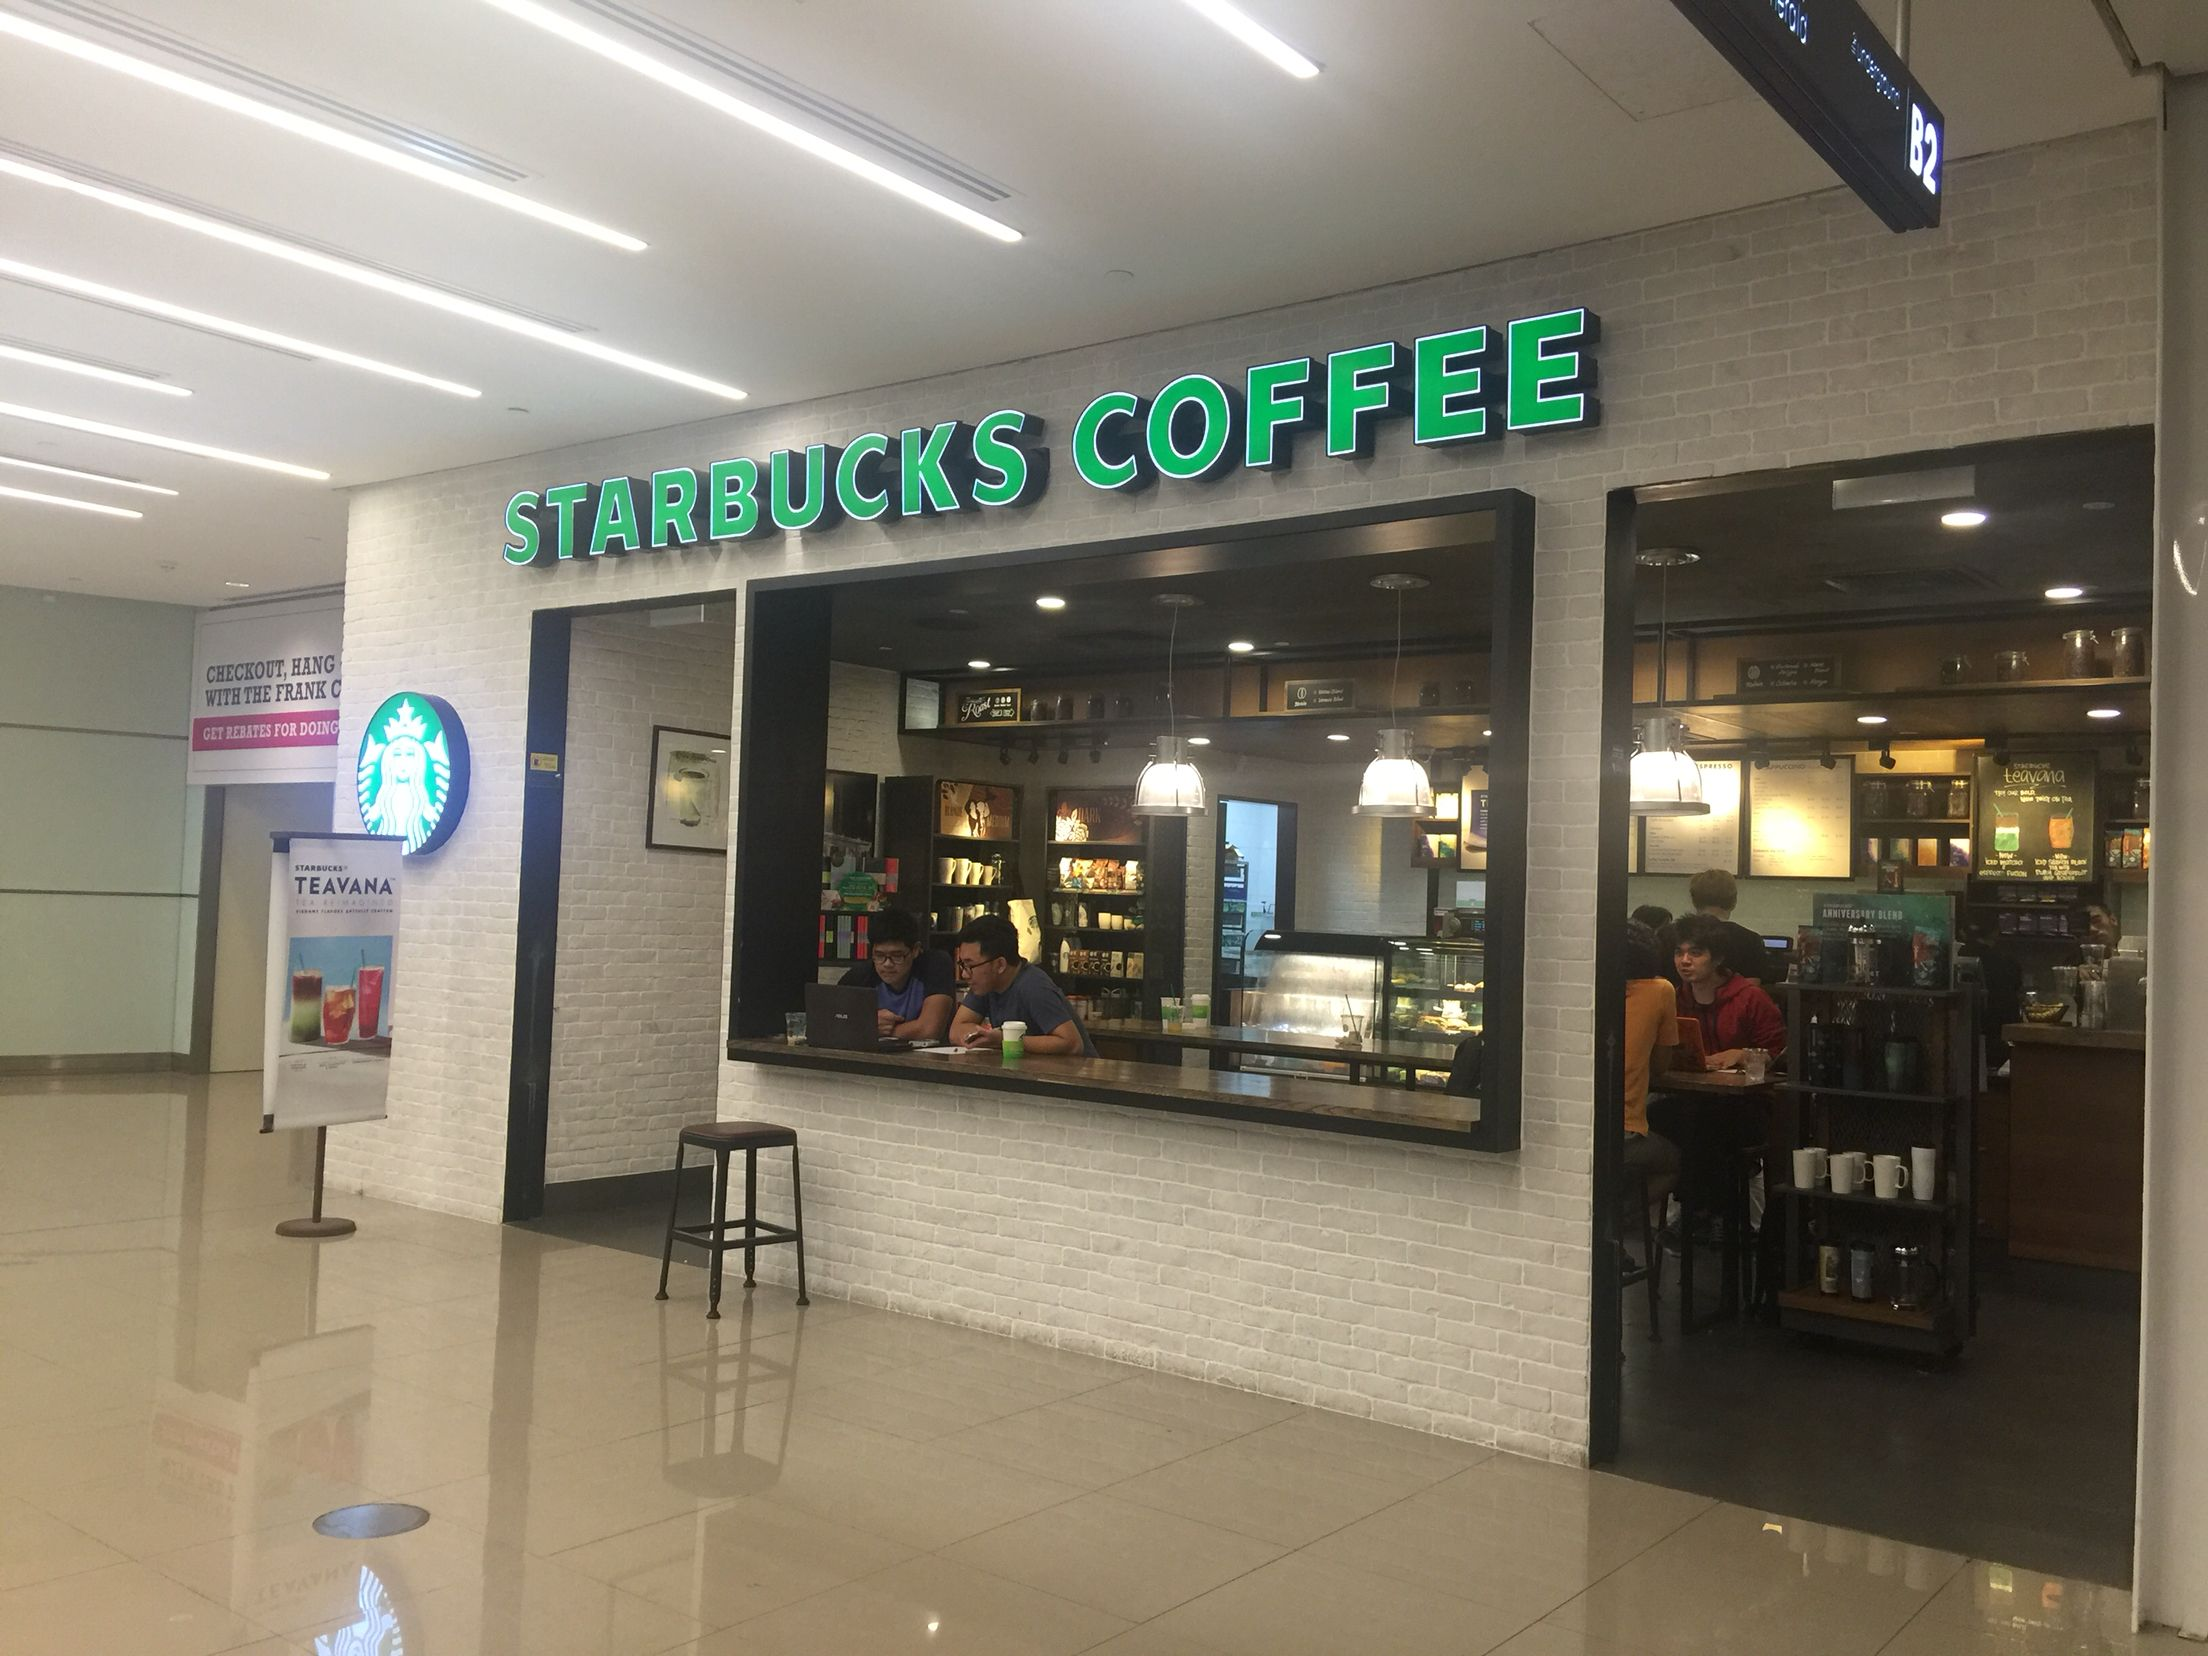 Starbucks At Orchard Gateway Mall In Singapore Starbucks Outlets Starbucks Teavana